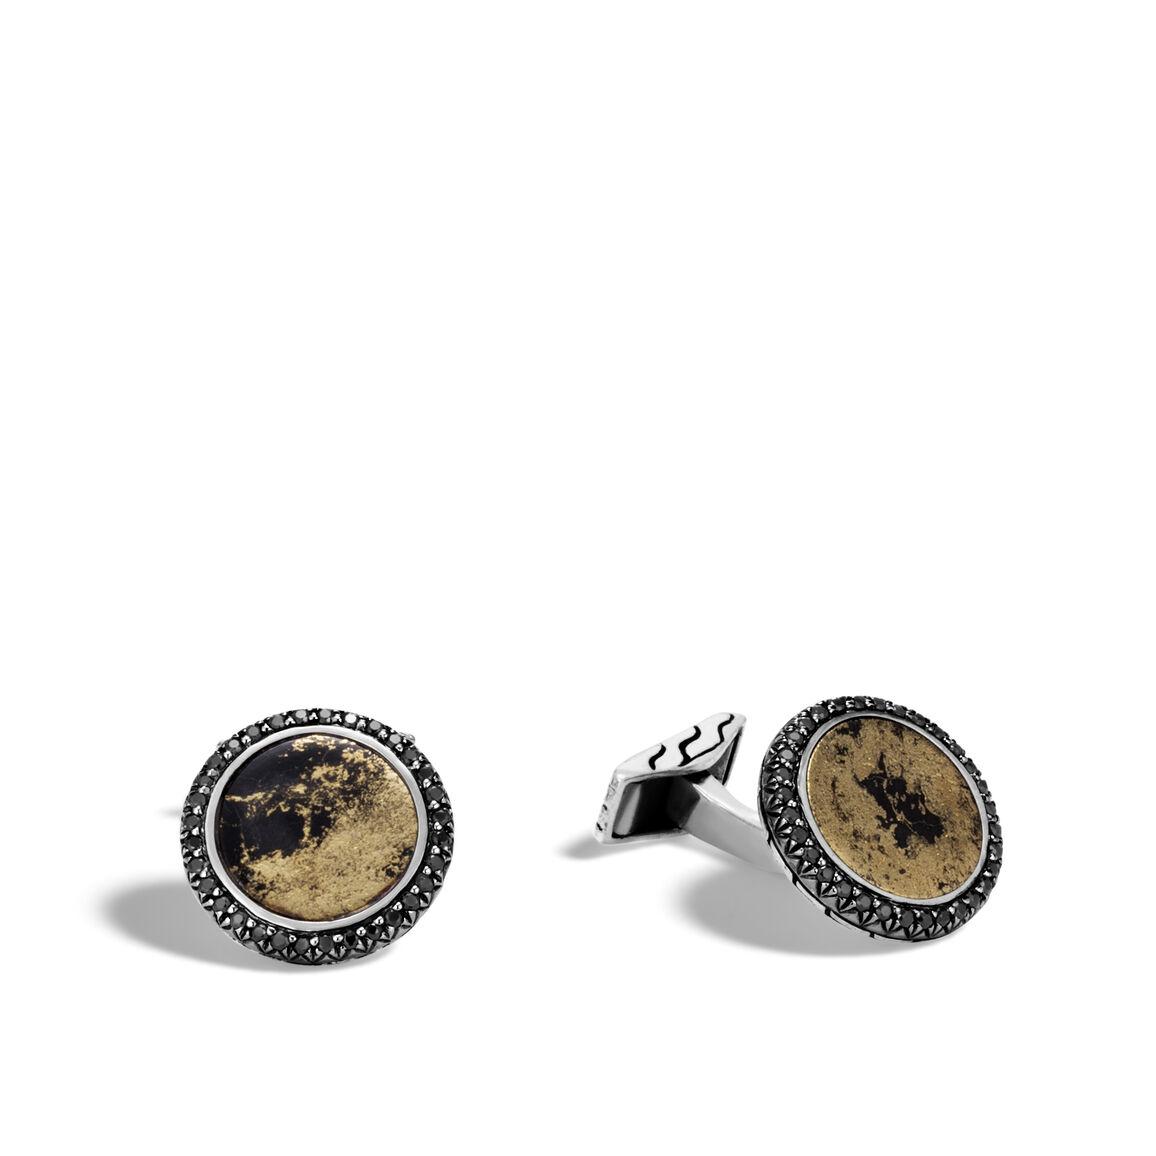 Classic Chain Cufflinks in Blackened Silver, 12MM Gemstone